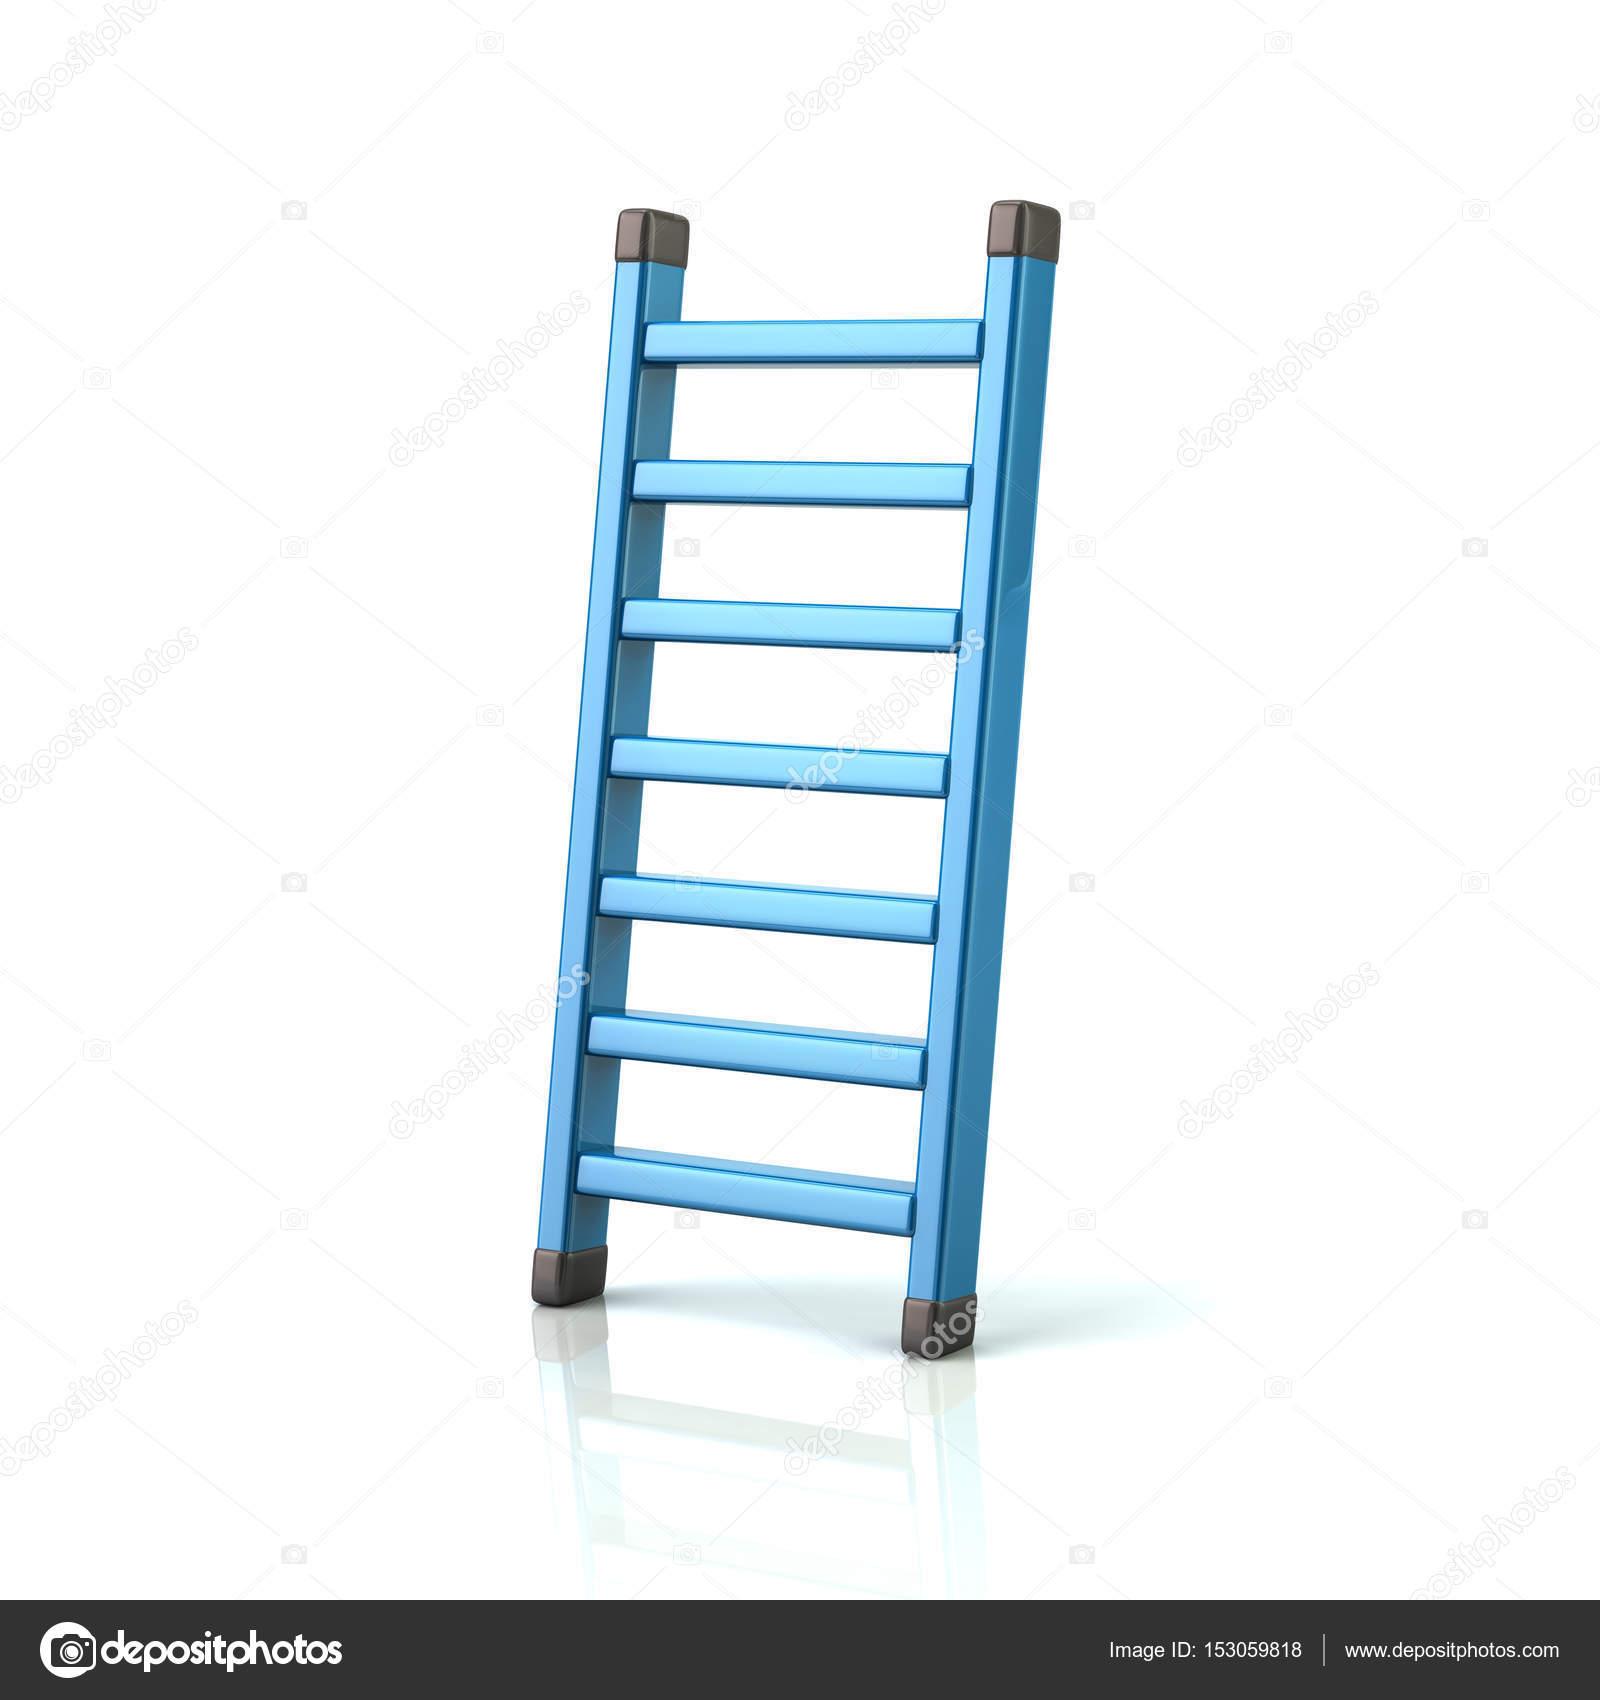 Blue ladder icon — Stock Photo © valdum #153059818